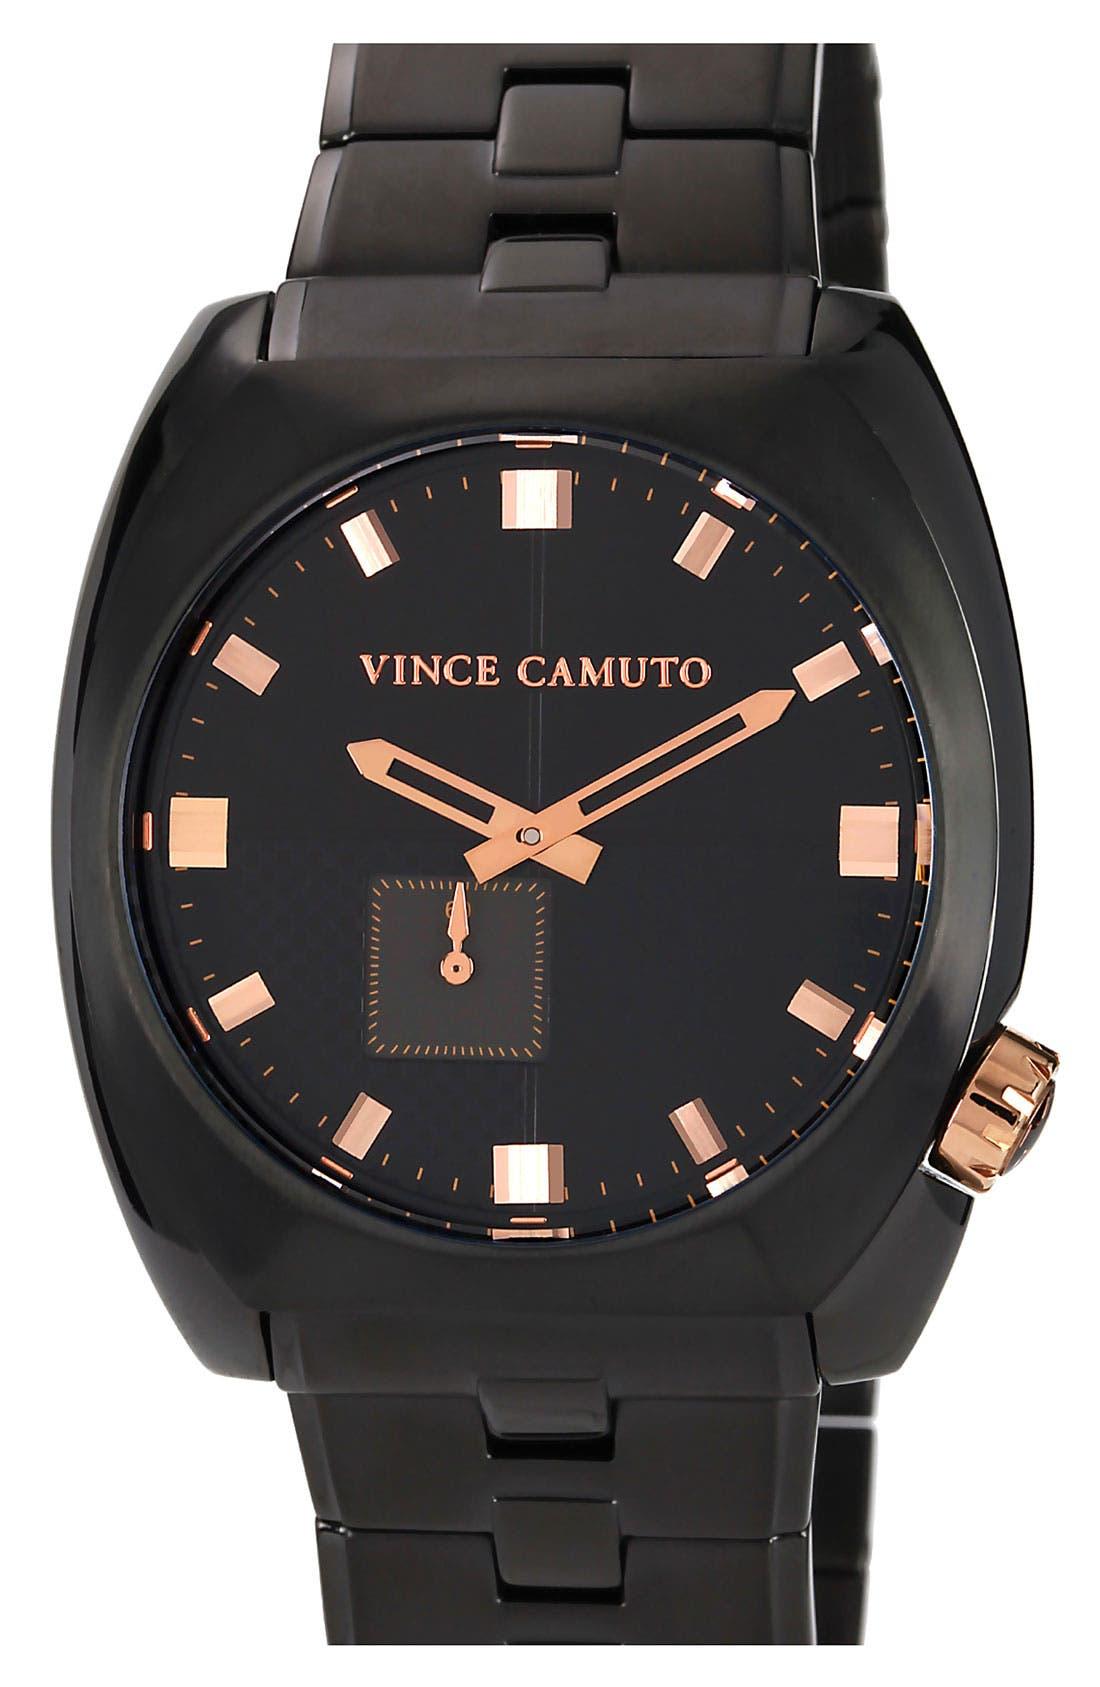 Alternate Image 1 Selected - Vince Camuto 'Cadet' Bracelet Watch, 43mm x 48mm